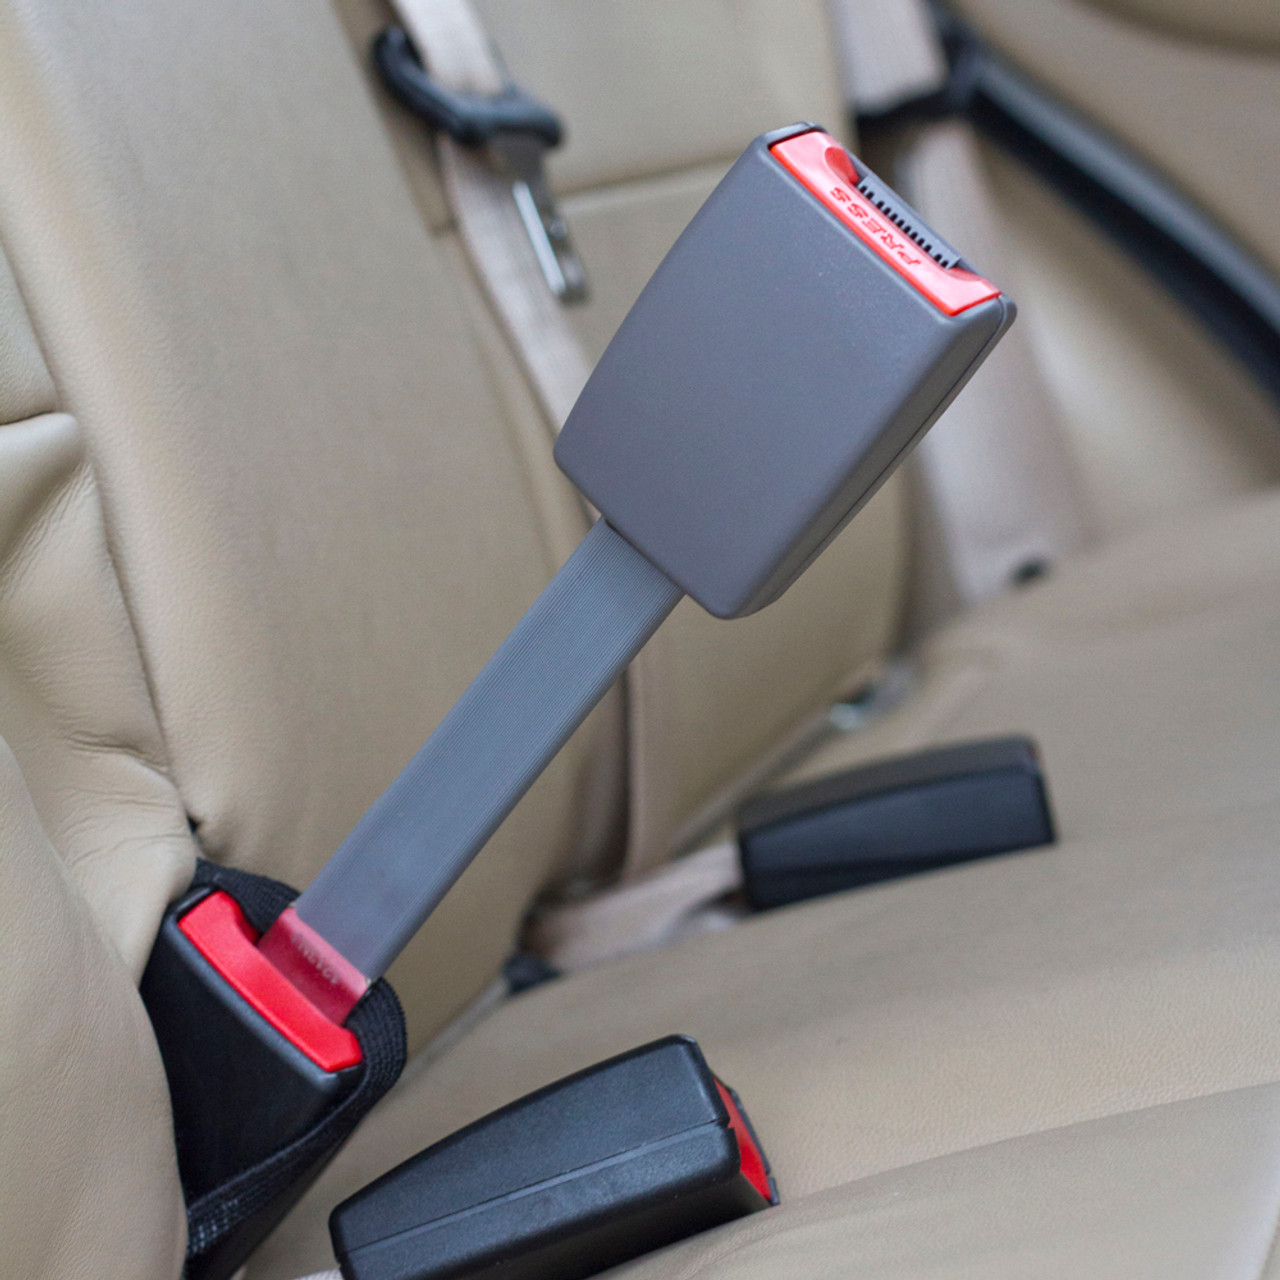 New 2004 2005 2006 Chevy Silverado Seat Belt Extender Front Seat